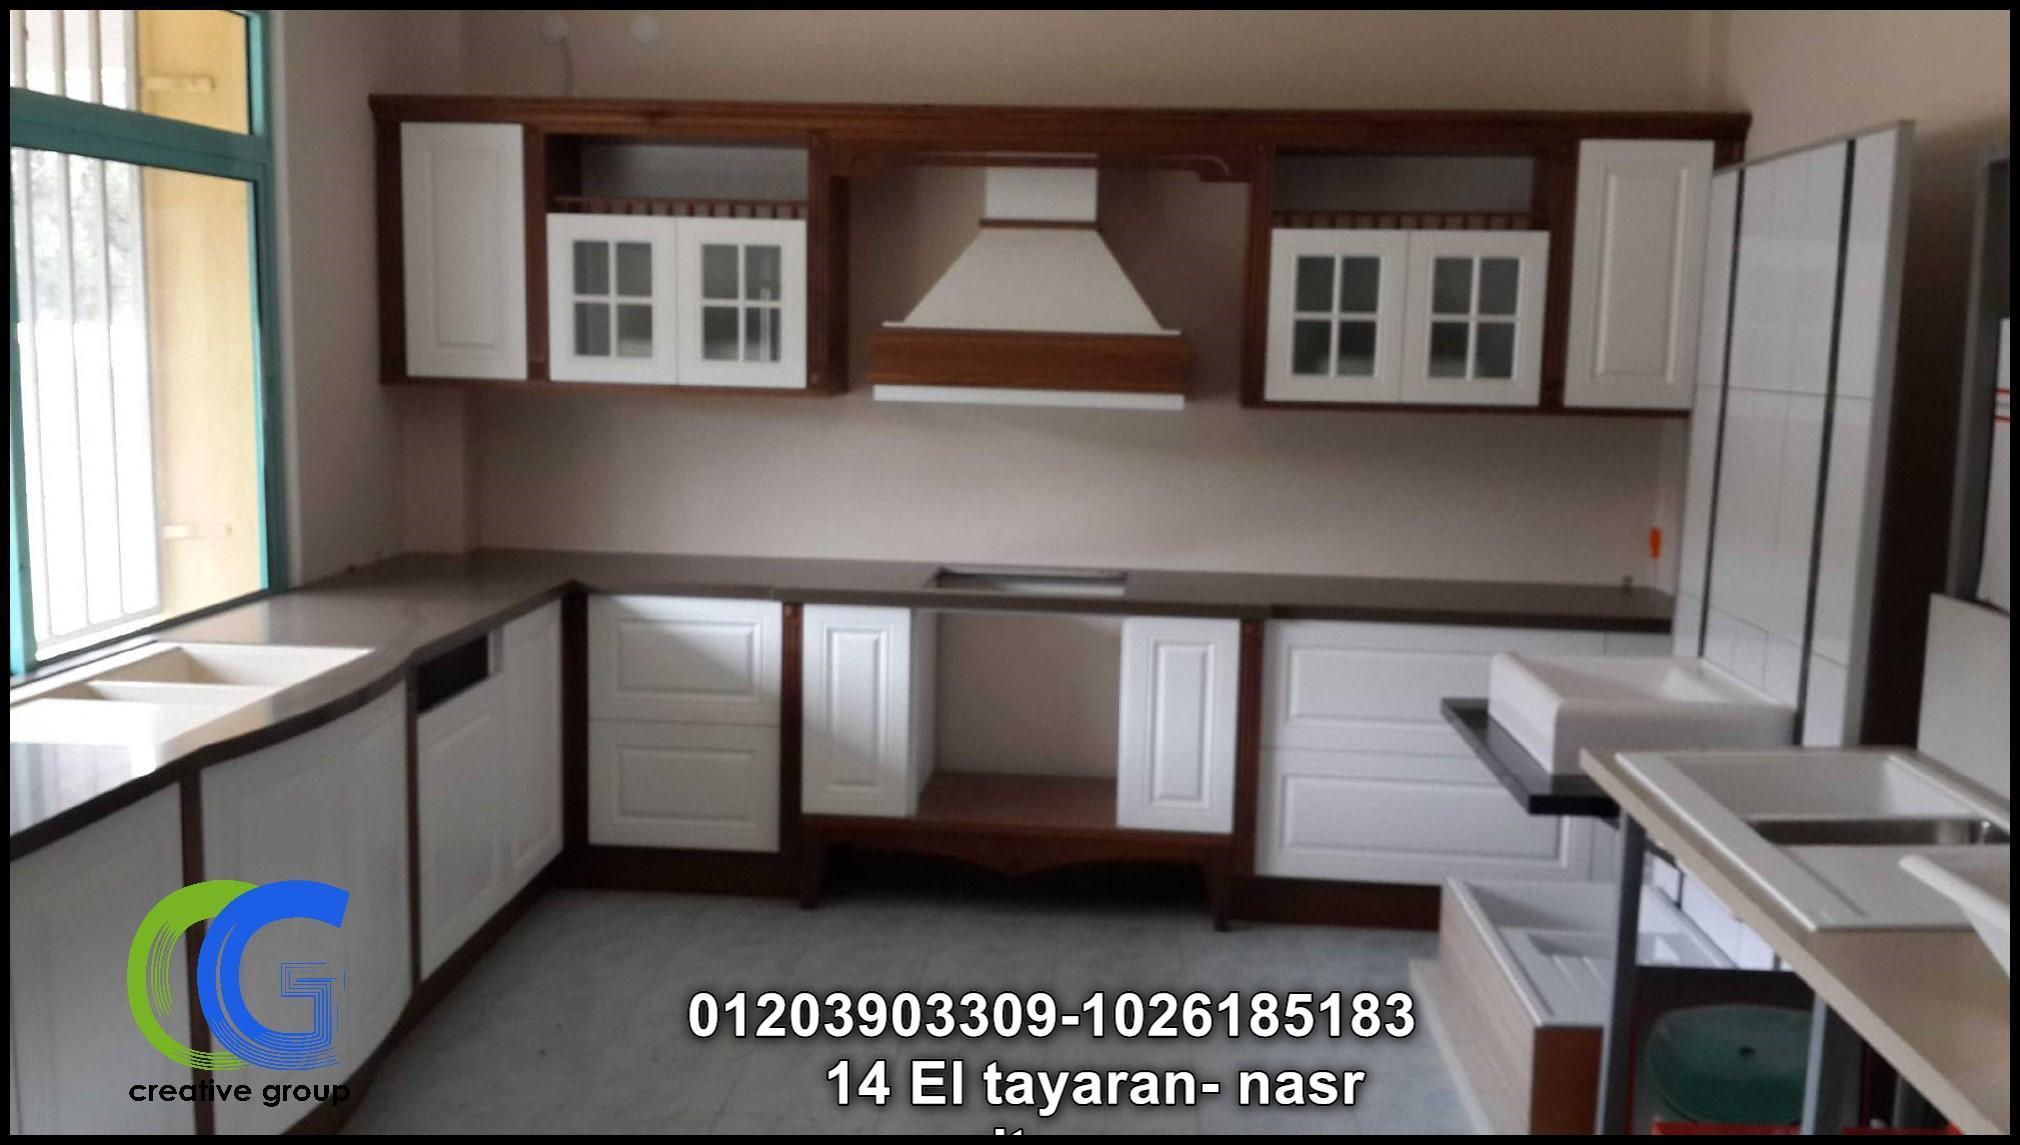 مطبخ خشب ( اسعار مميزة )- كرياتف جروب 01203903309   704504397